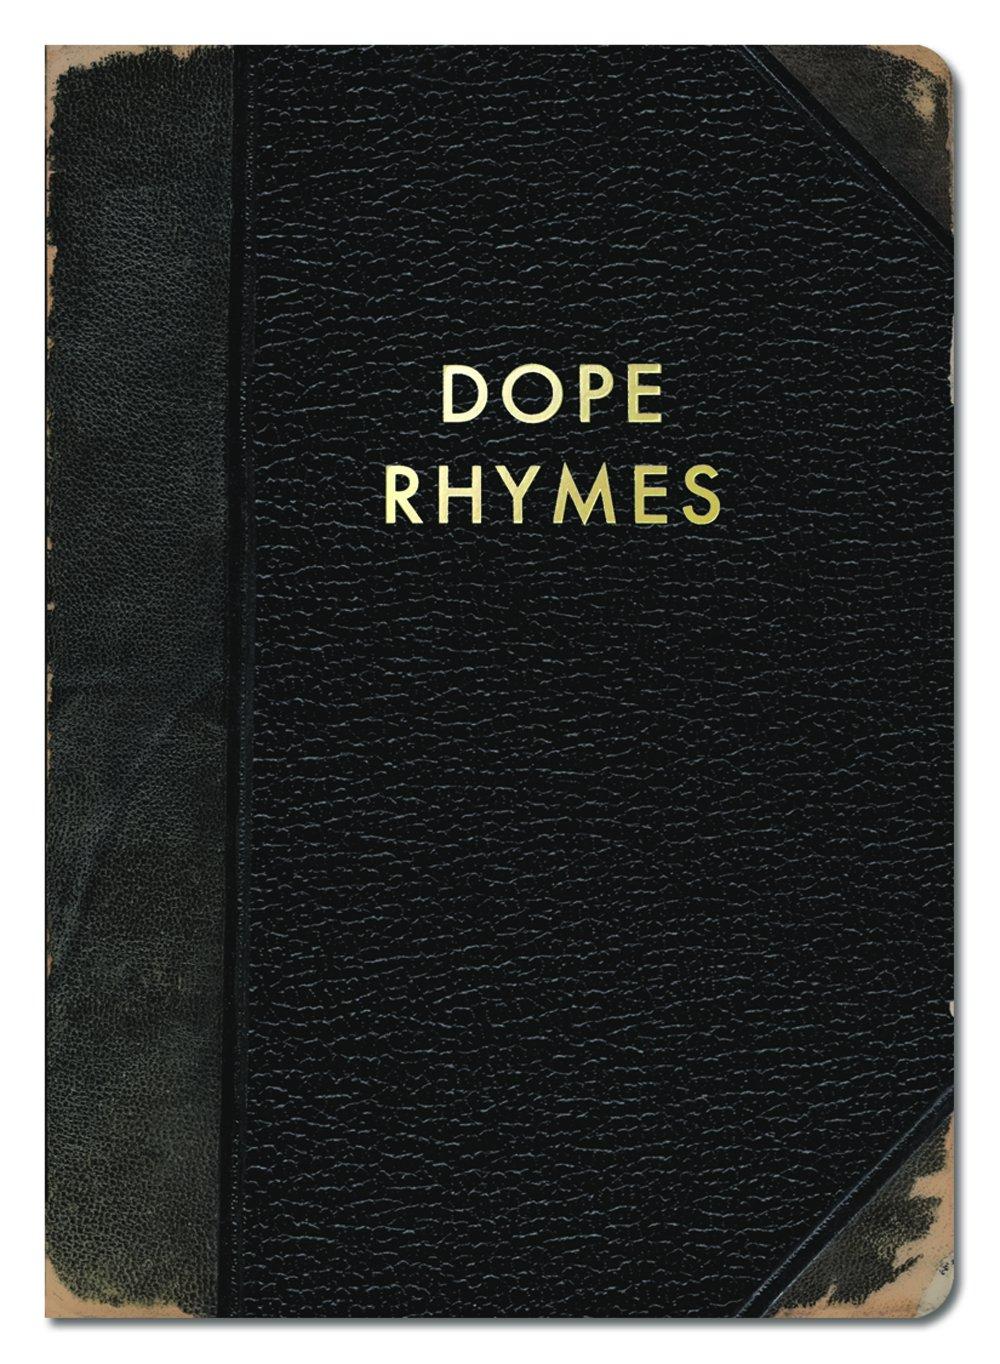 Dope Rhymes Journal: Kim Bagwill: 9780996811101: Amazon.com: Books